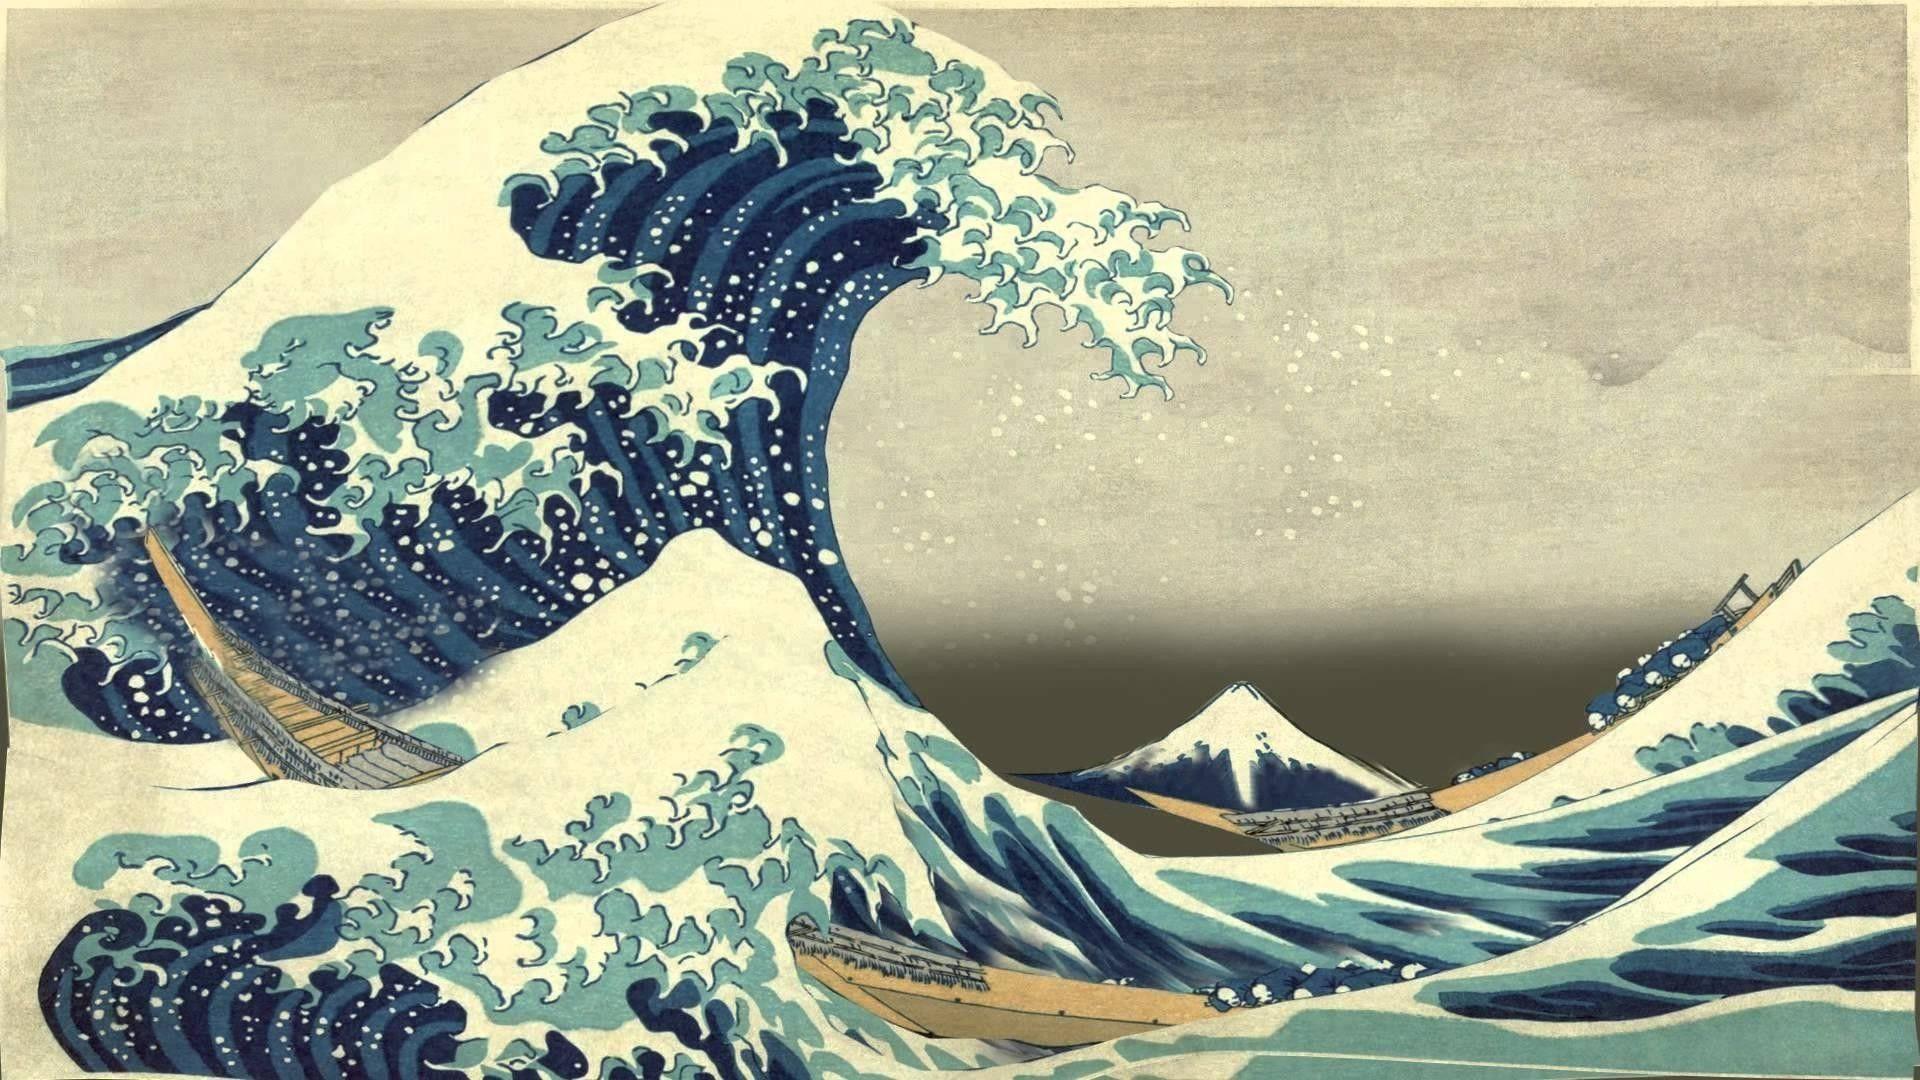 The Great Wave Off Kanagawa Hd Wallpapers Wallpaper Cave